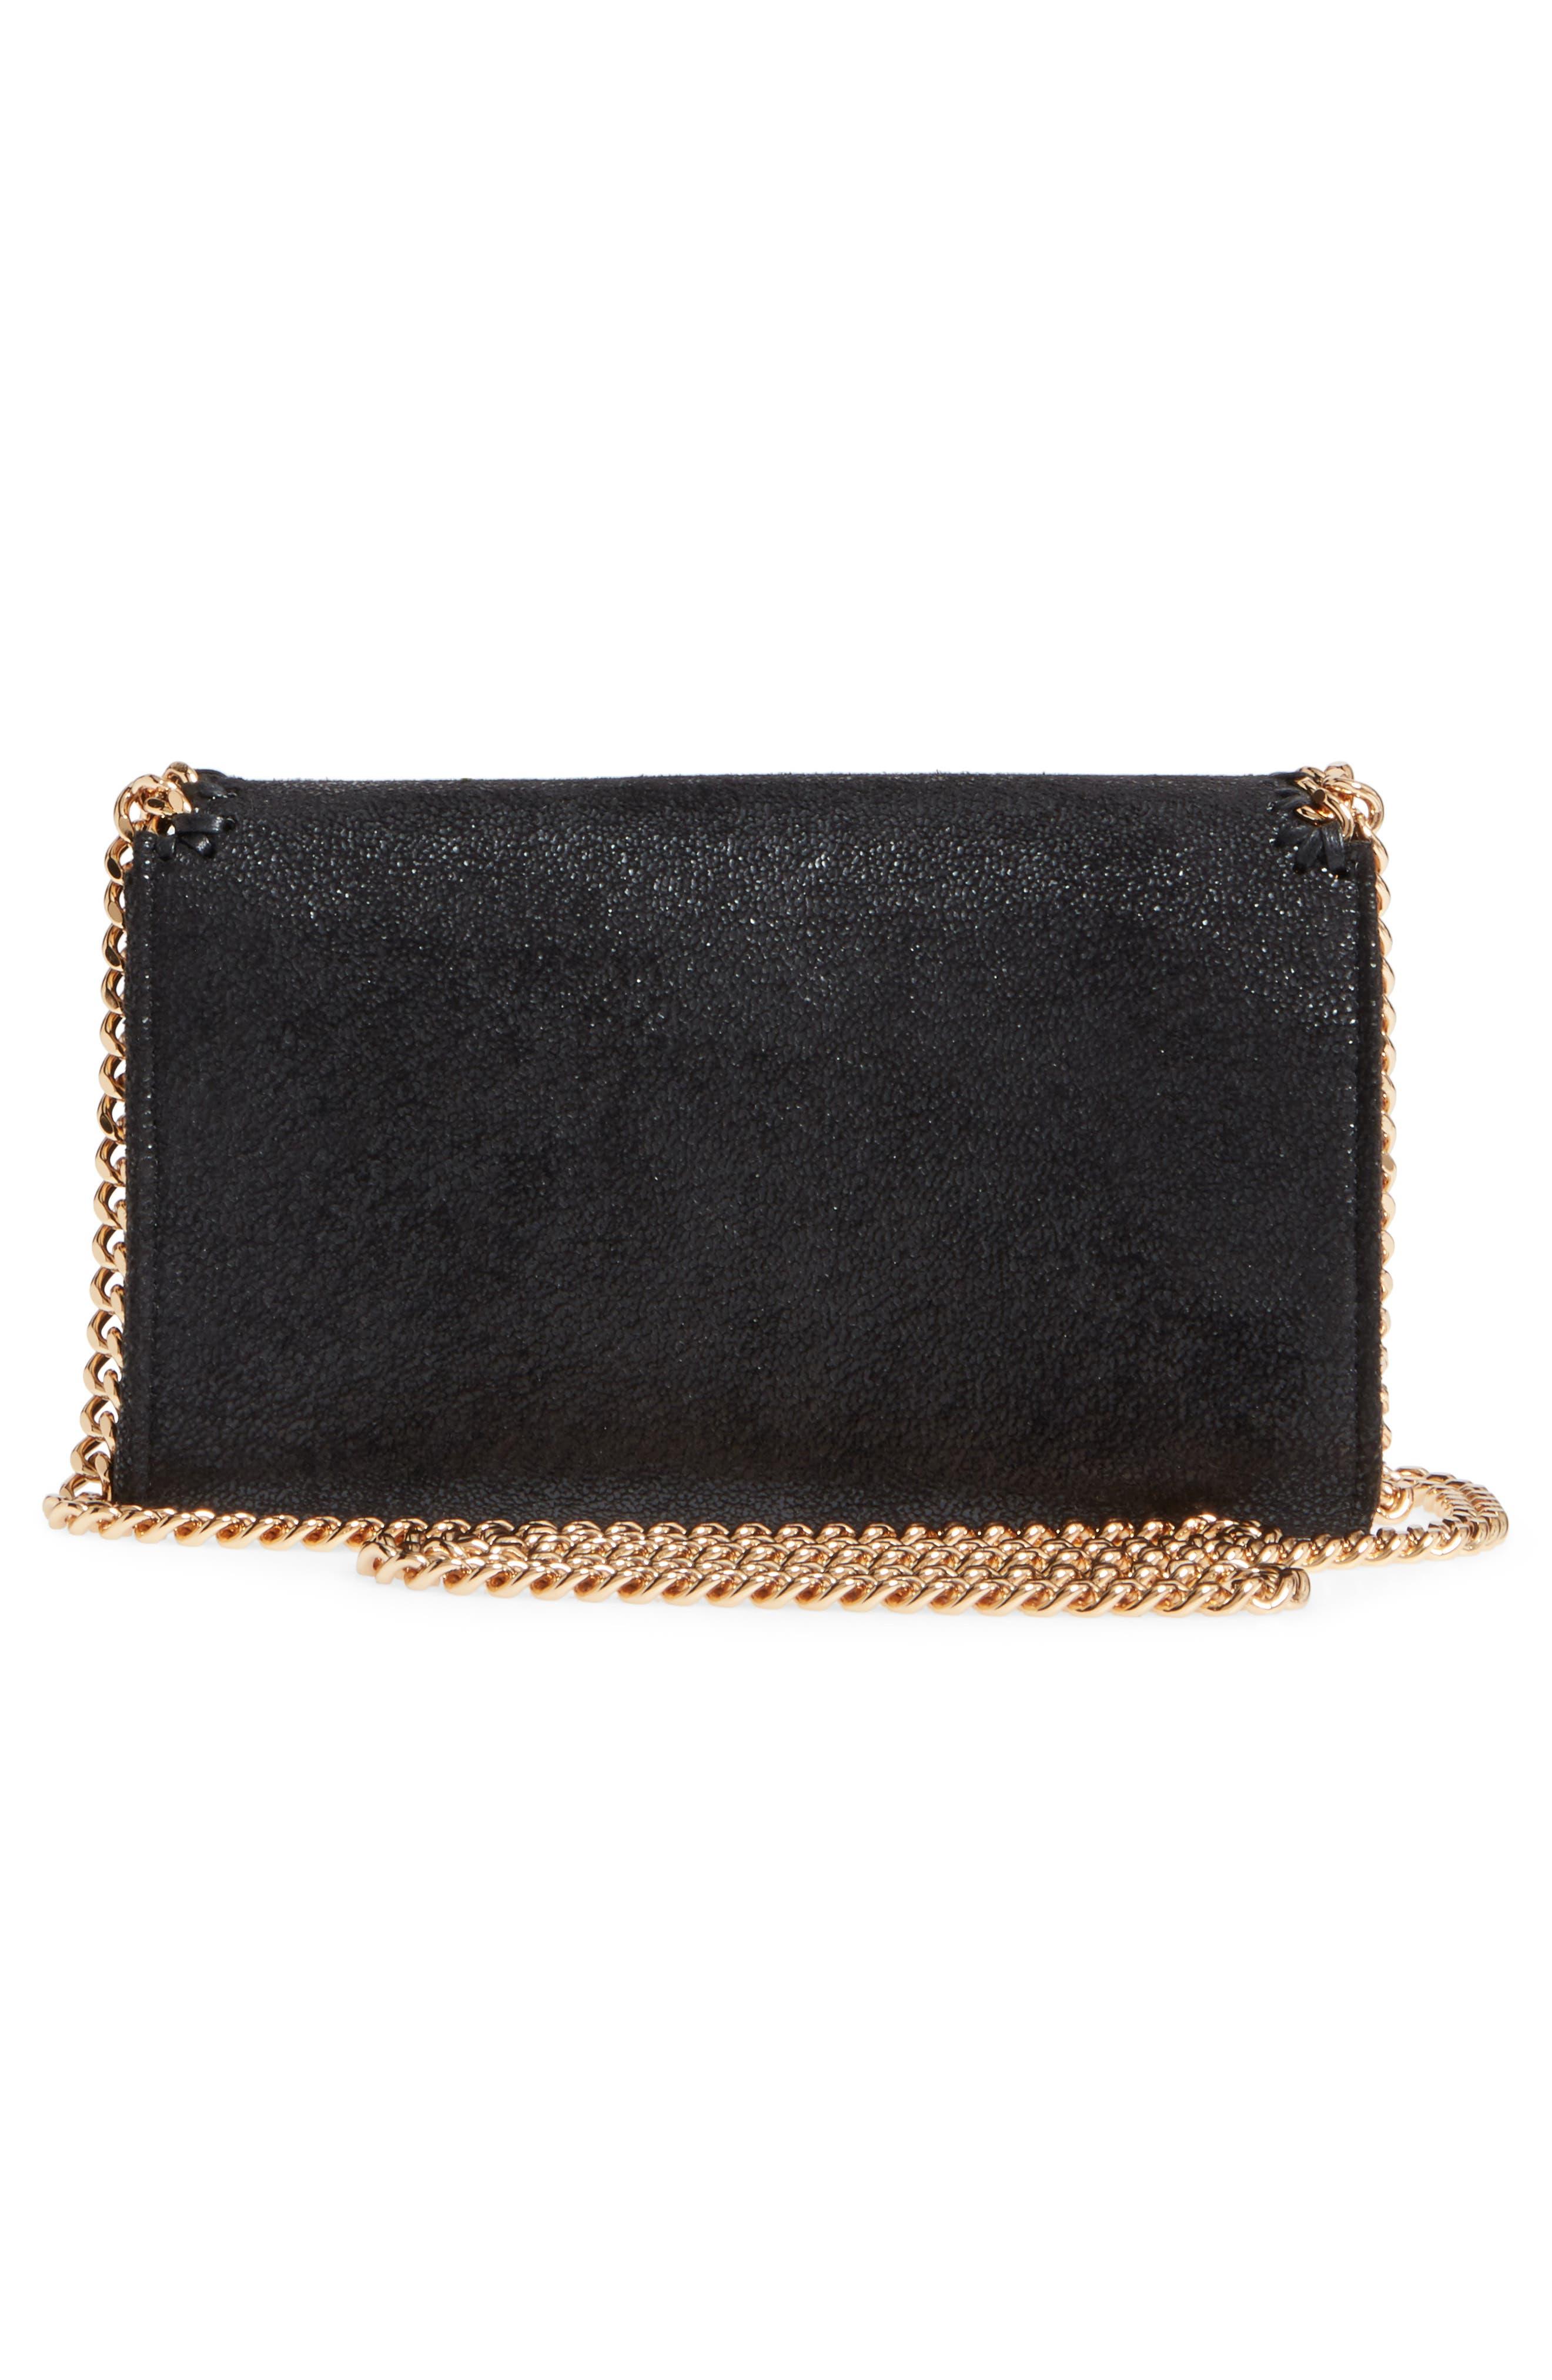 STELLA MCCARTNEY,                             Shaggy Deer Faux Leather Crossbody Bag,                             Alternate thumbnail 3, color,                             BLACK